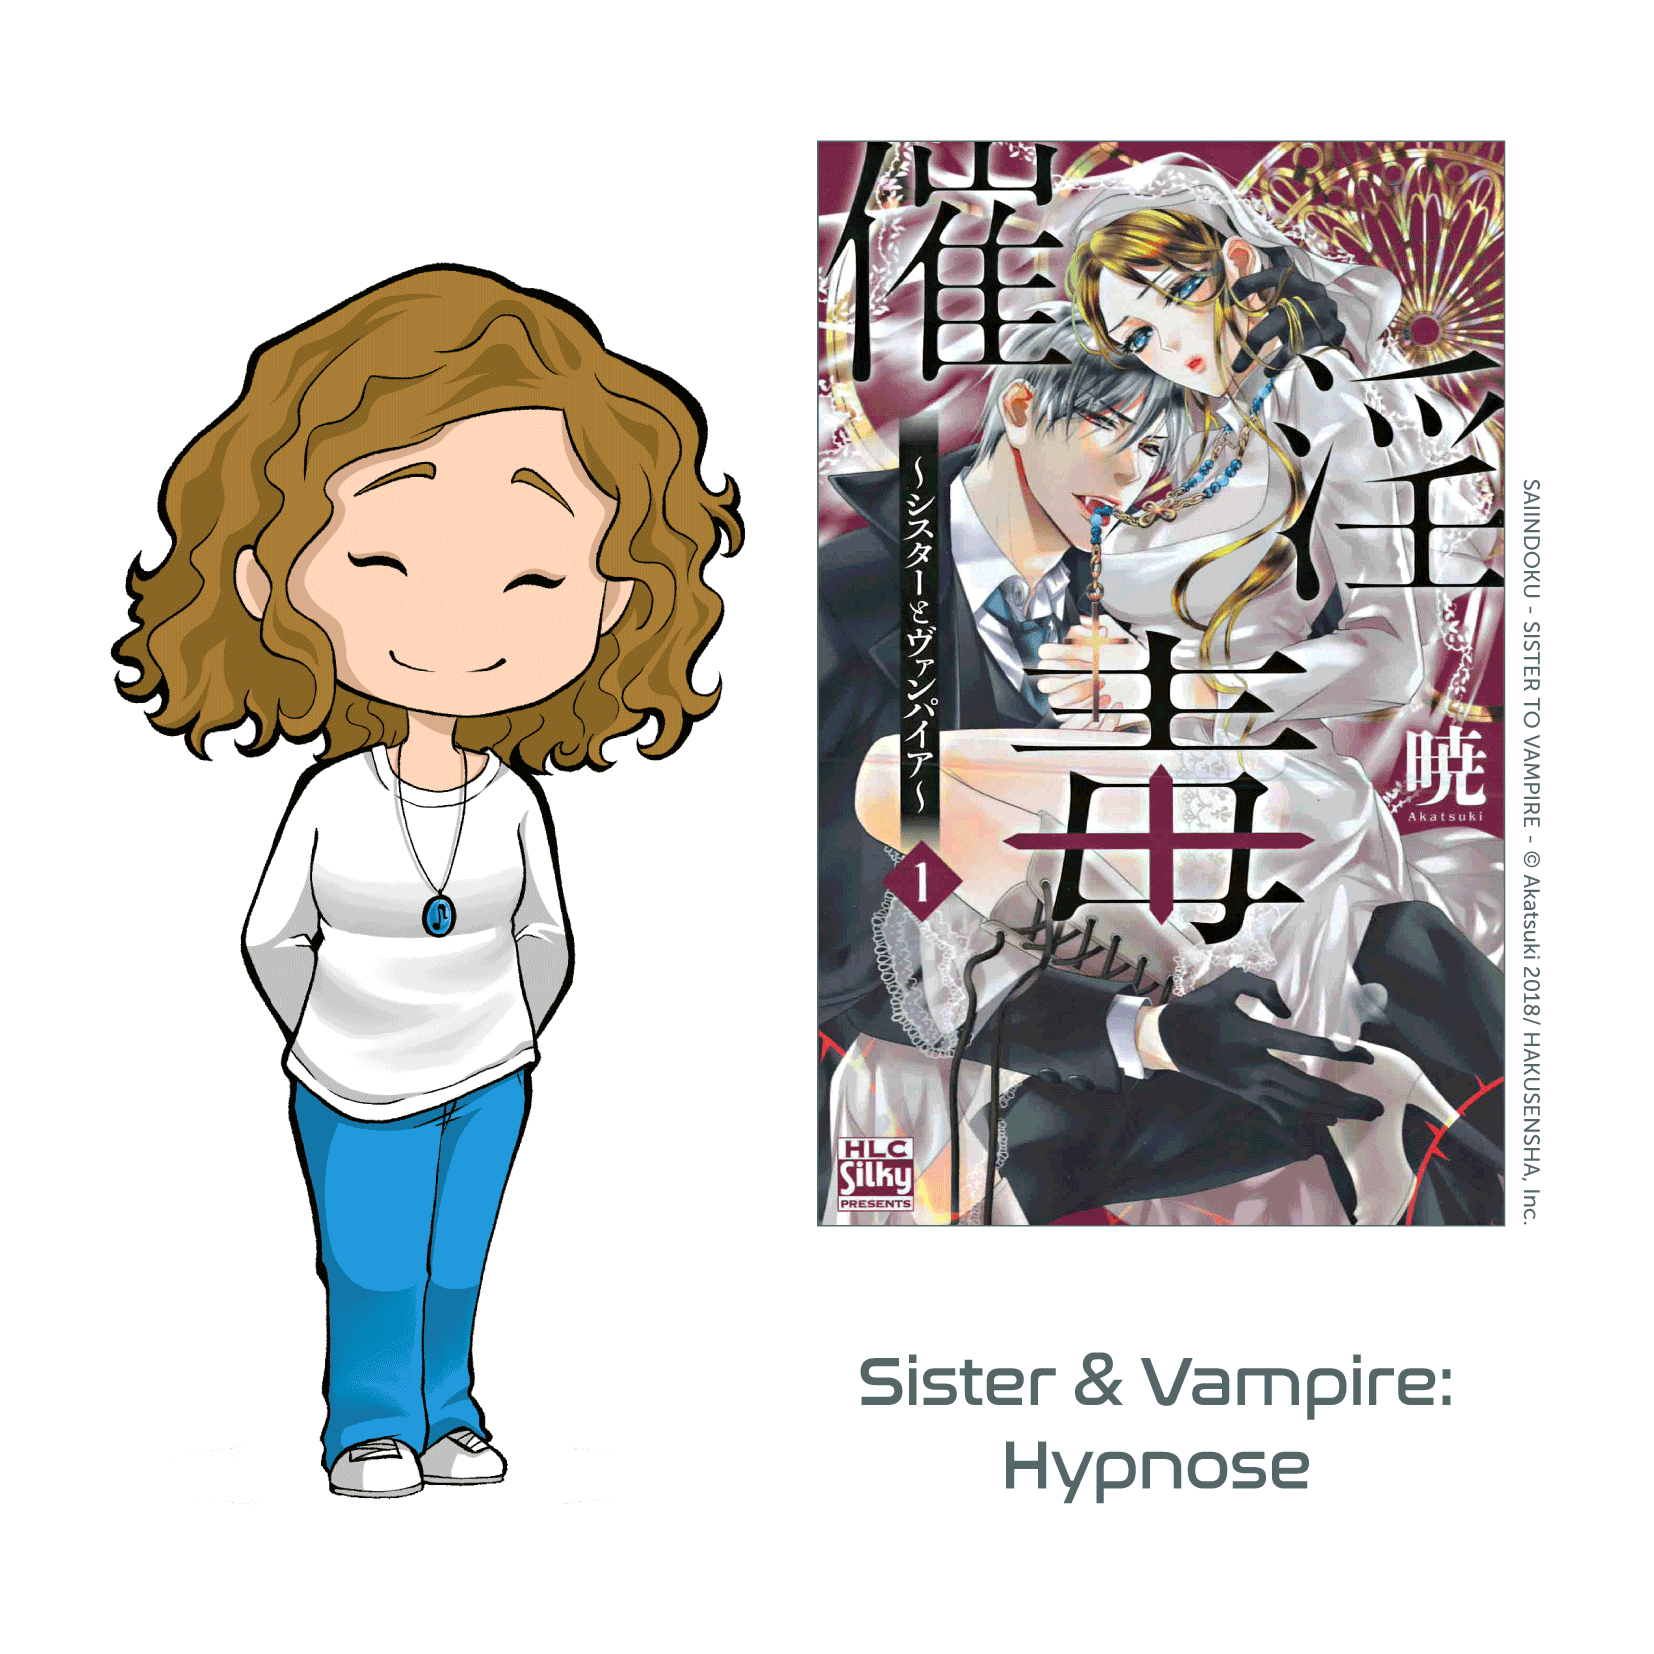 Sister & Vampire: Hypnose